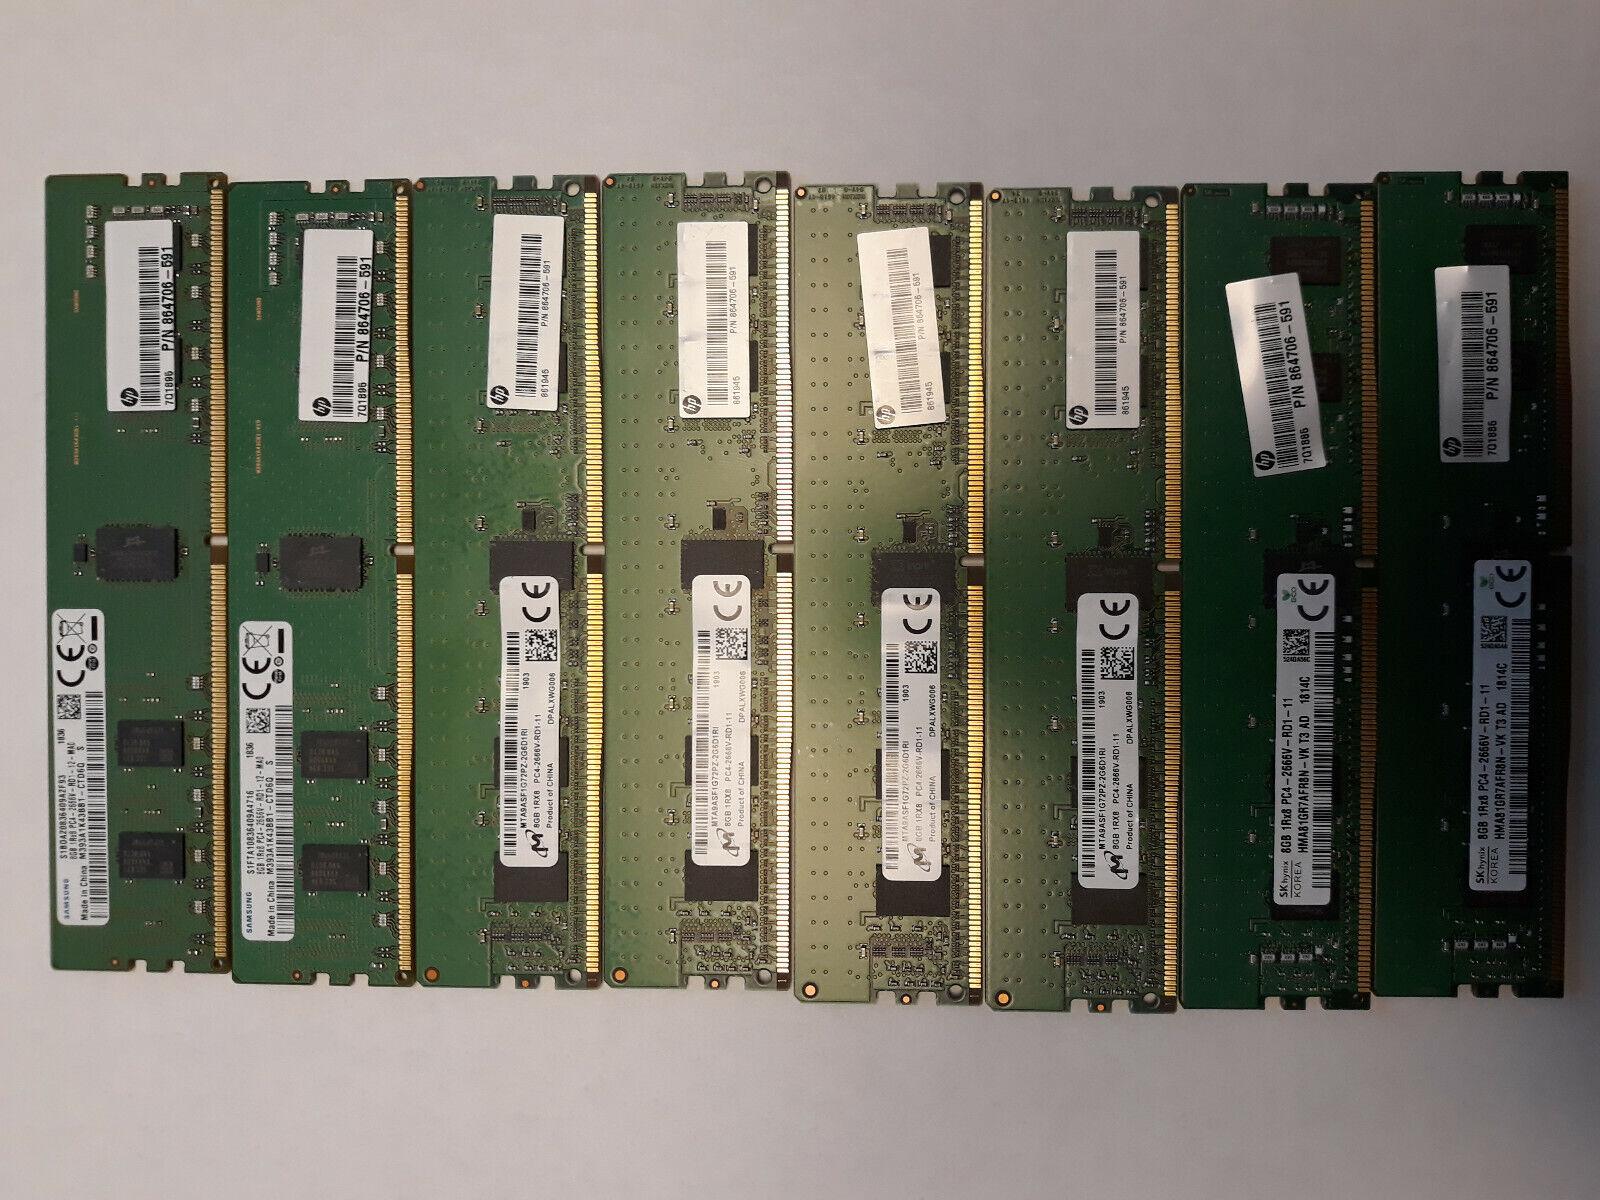 DDR4 PC4-21300 2666Mhz ECC Registered RDIMM 1Rx8 A-Tech 8GB Module for HP ProLiant DL60 Gen9 G9 Server Specific Memory Ram AT322629SRV-X1R5